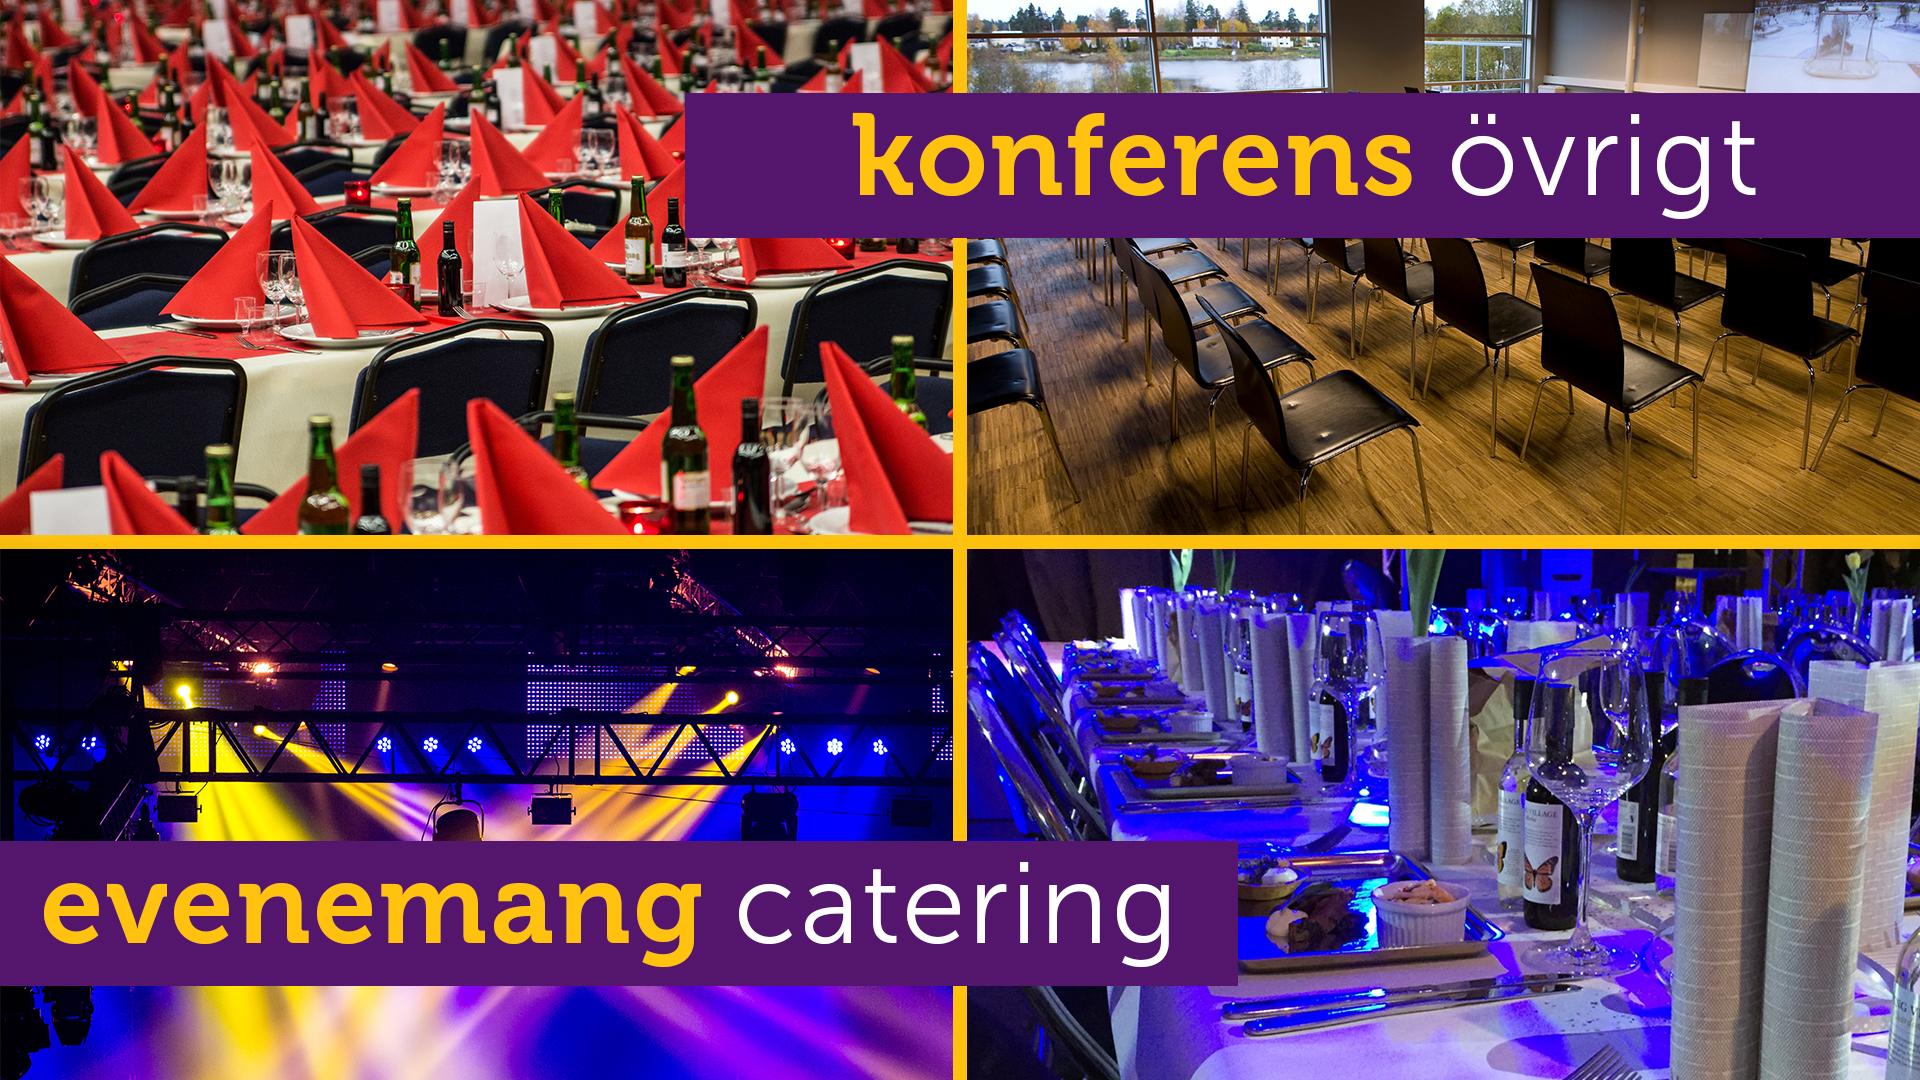 Evenemang - Konferens - Catering